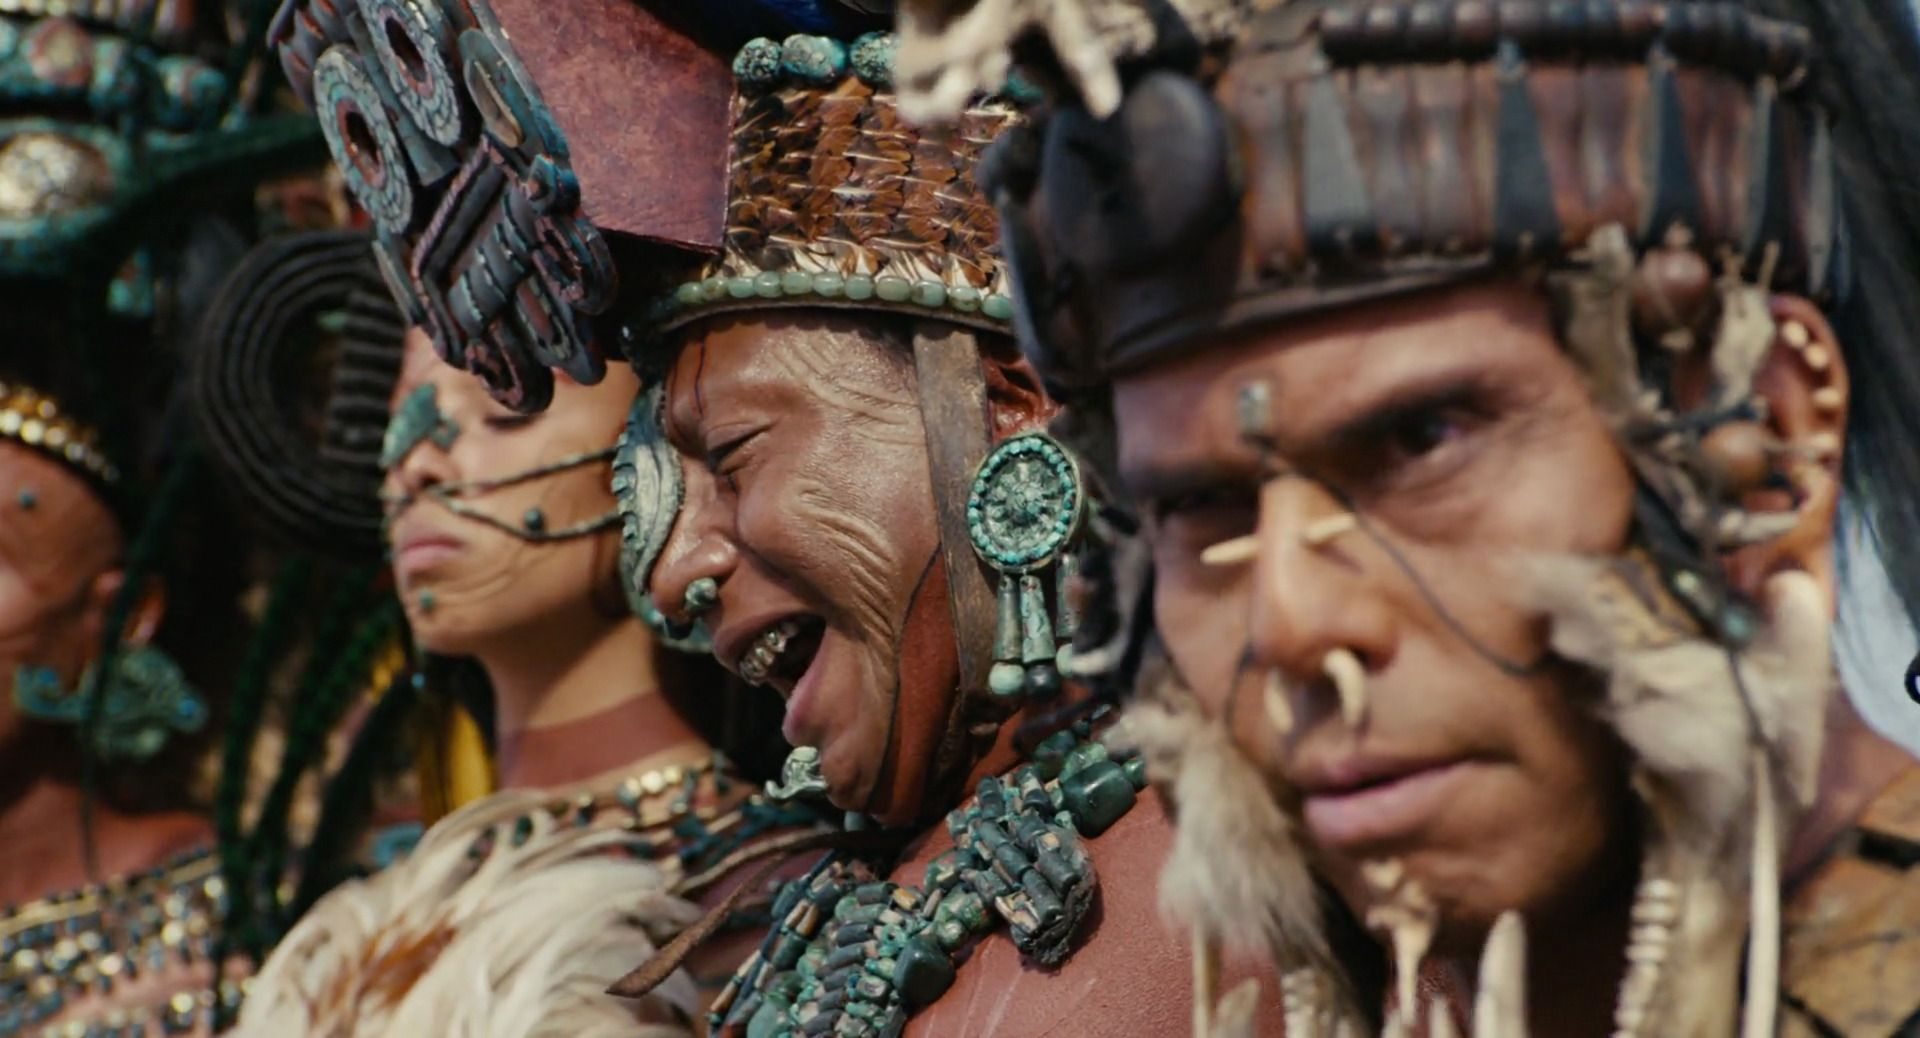 apocalypto 2006 movie screencapscom aztecs mayans